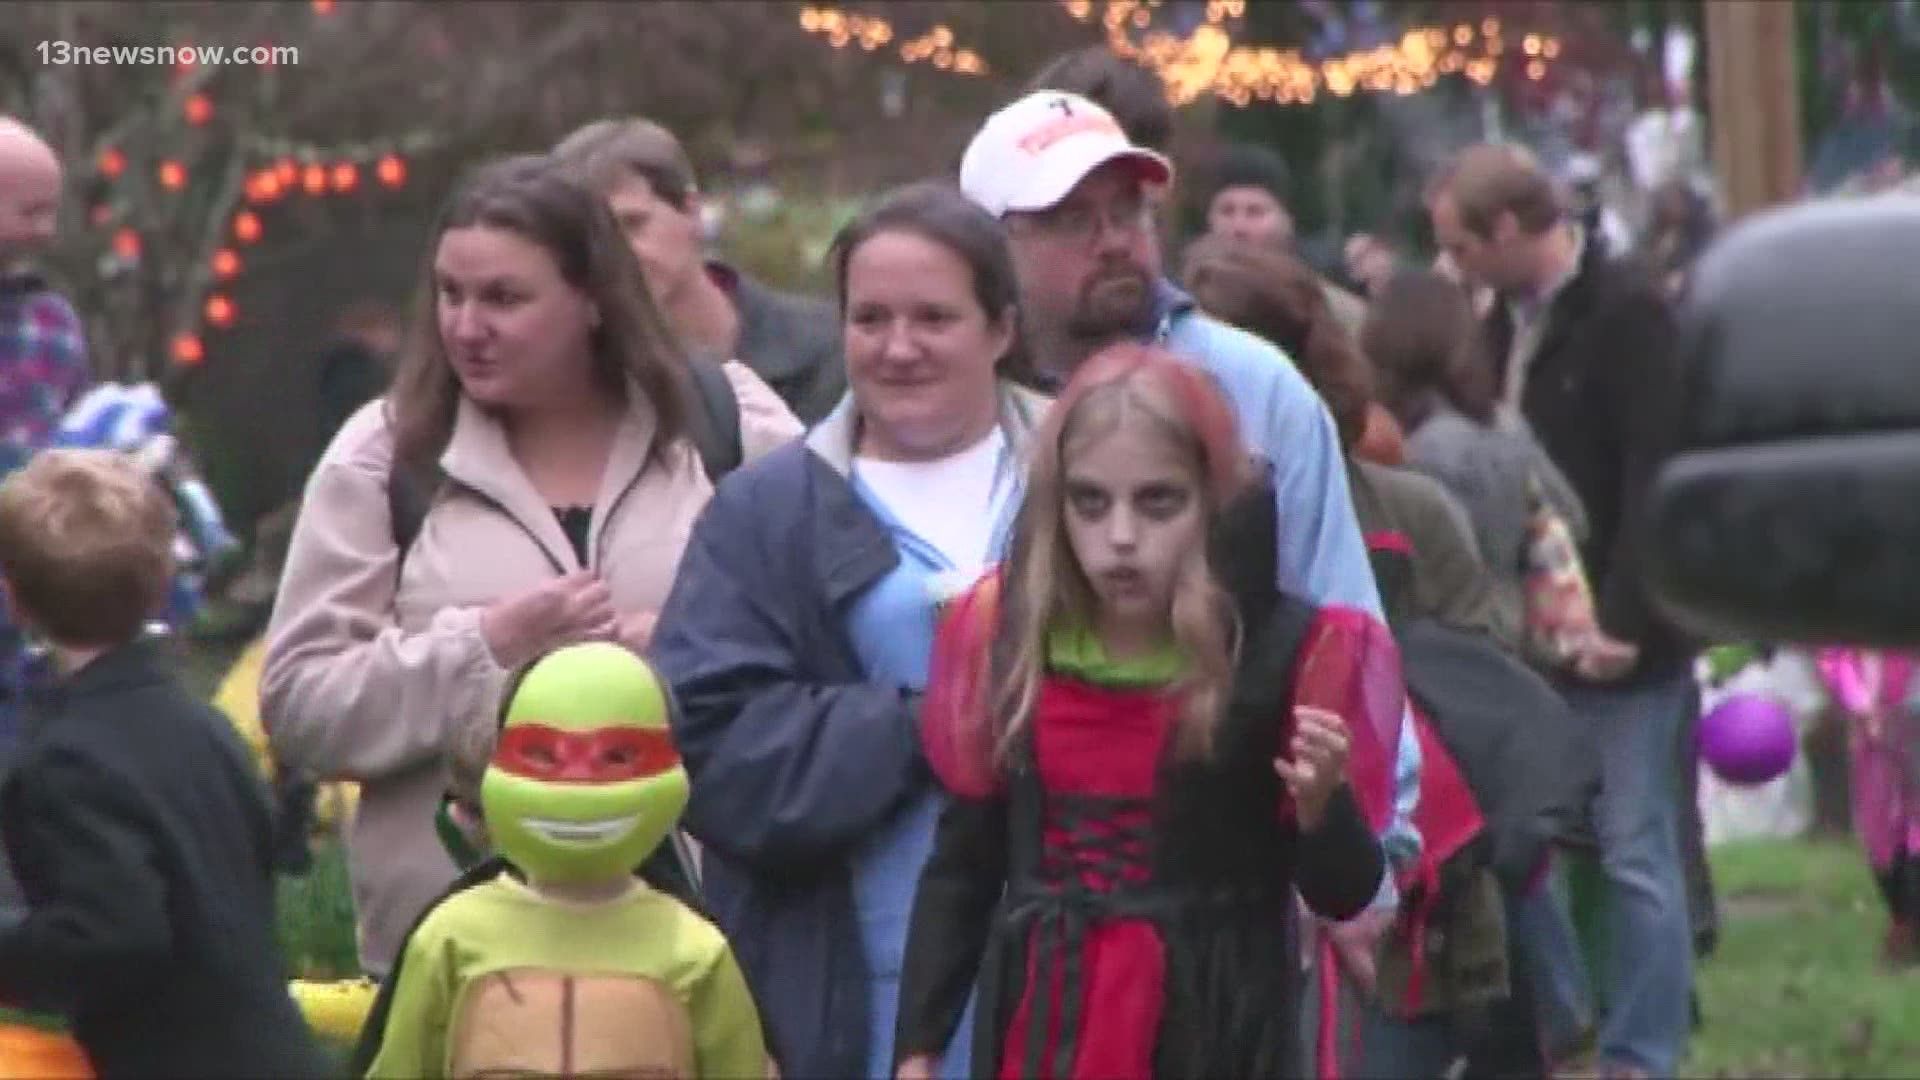 Halloween Events Jacksonville Fl 2020 Is Halloween canceled this year? | firstcoastnews.com